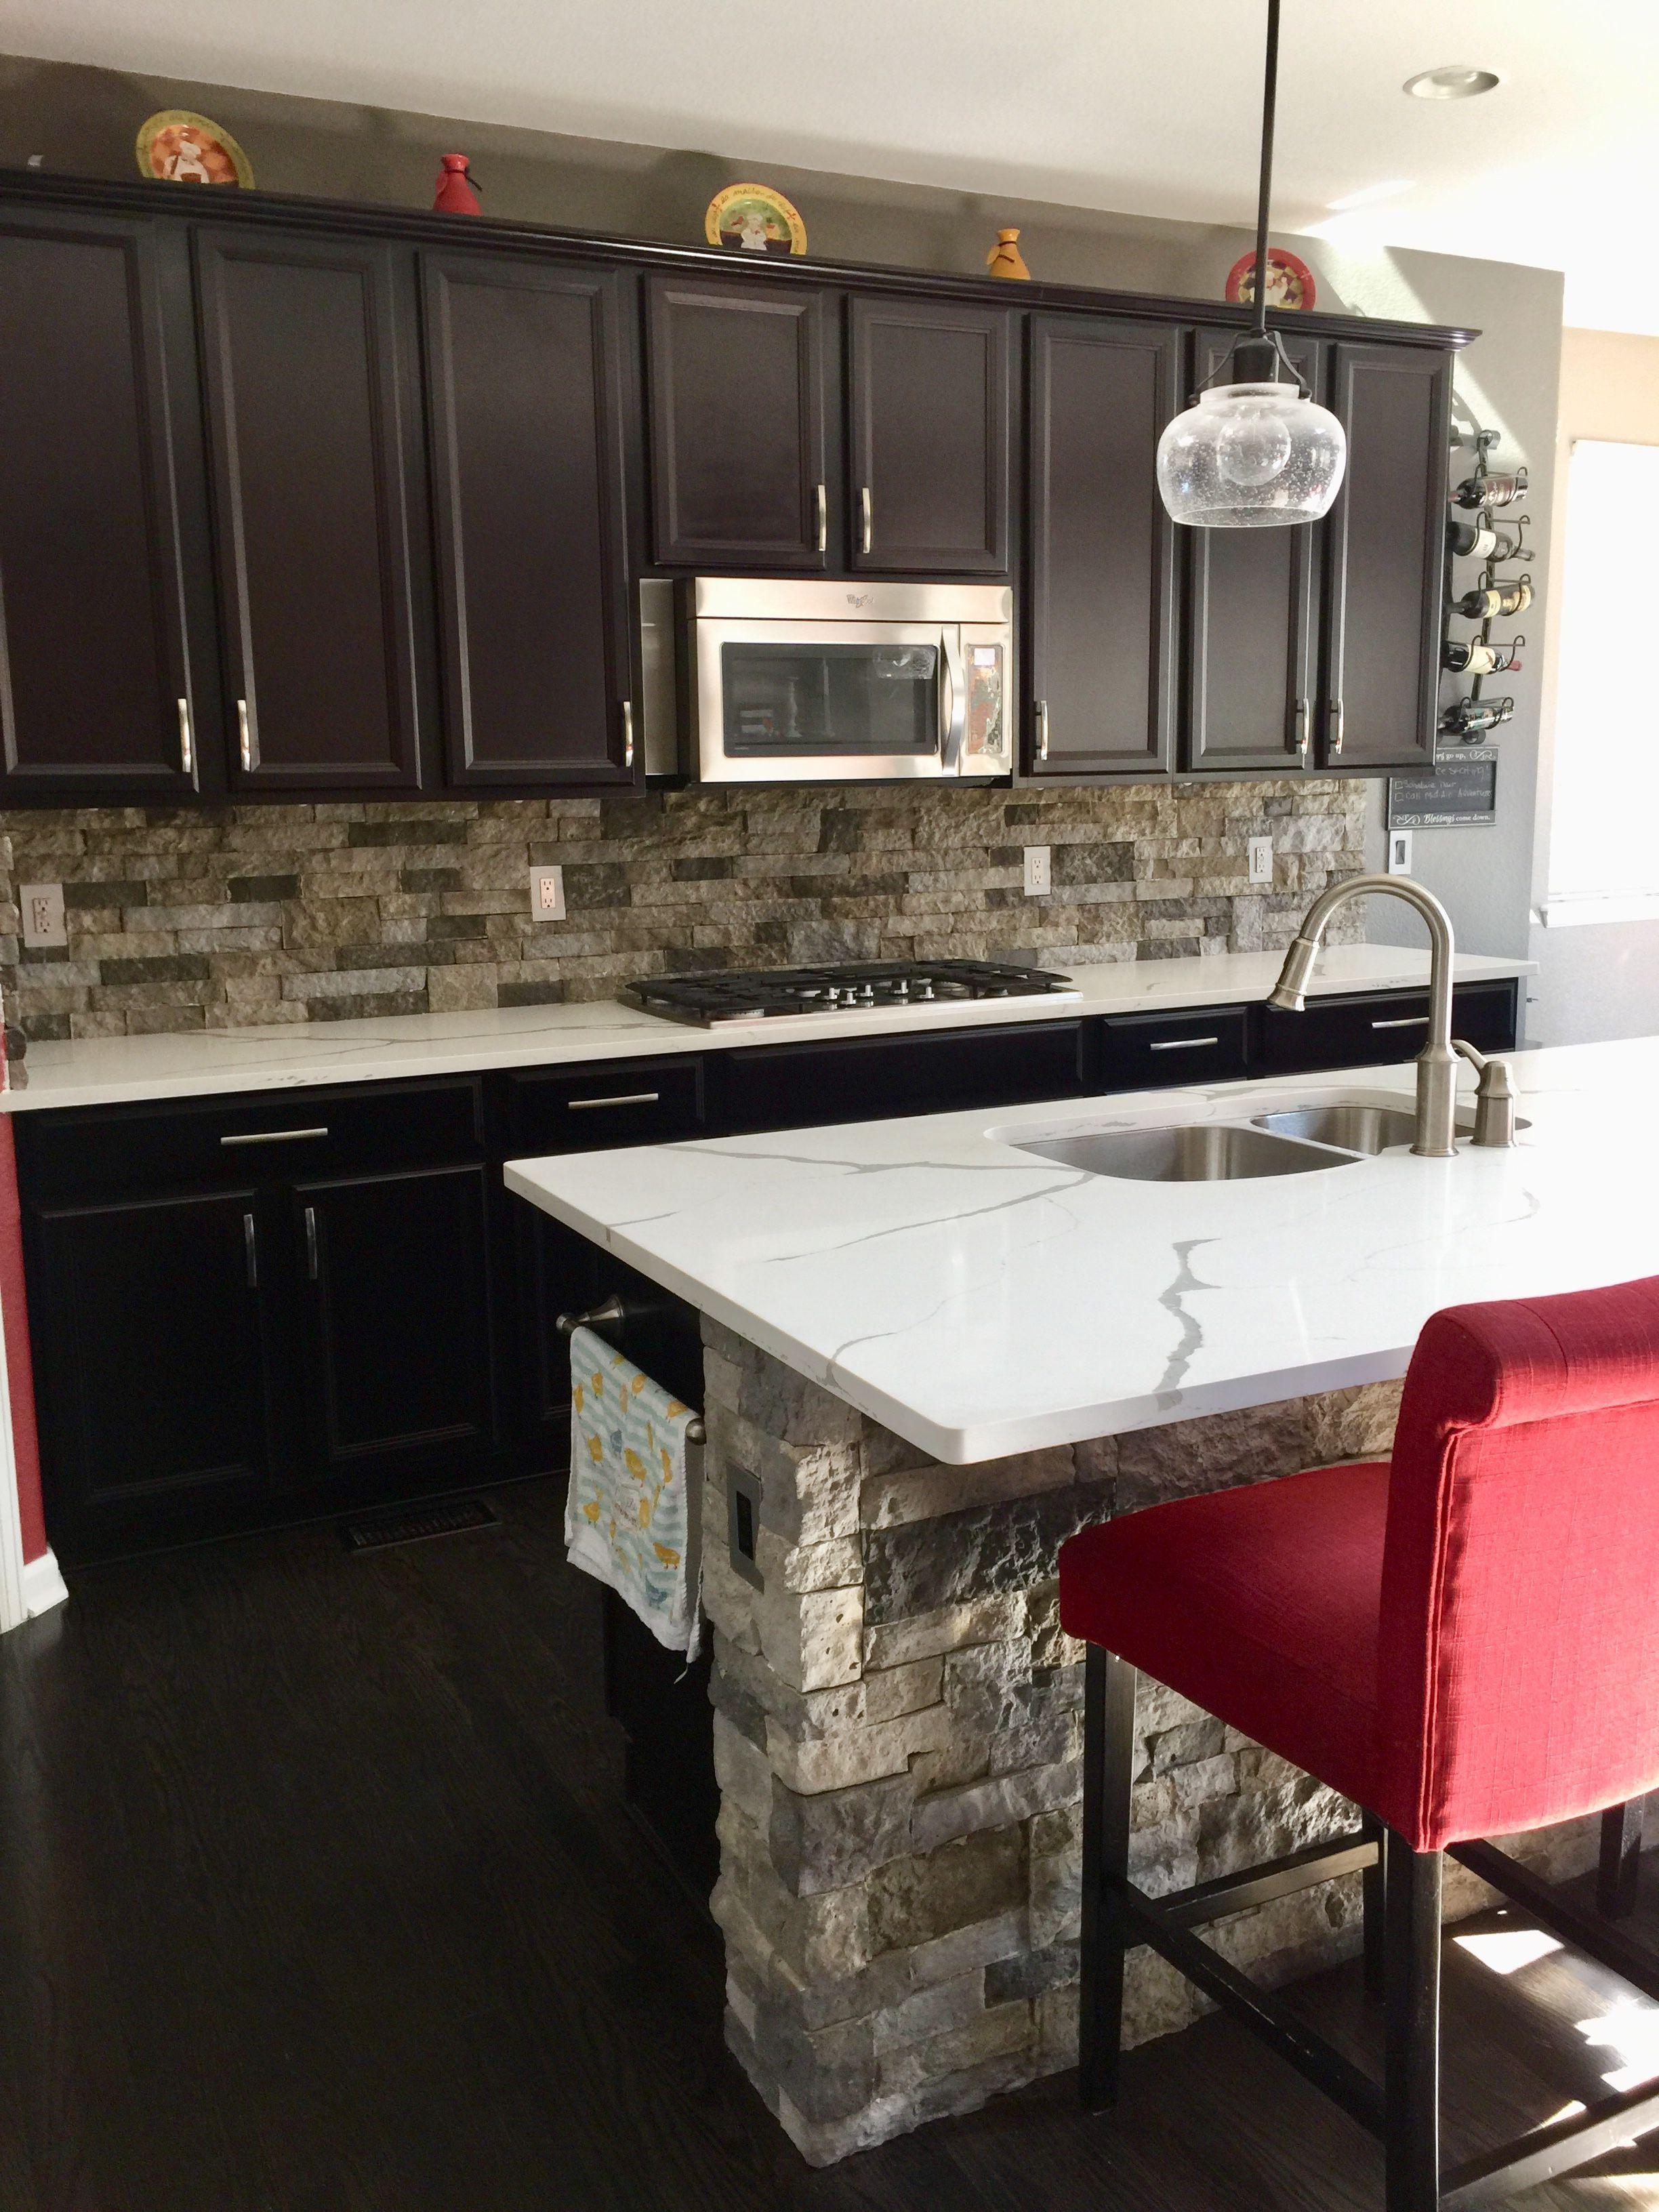 Brillian Stone Kitchen Backsplash Ideas Home Depot Kitchen Remodel Espresso Kitchen Cabinets Home Depot Kitchen